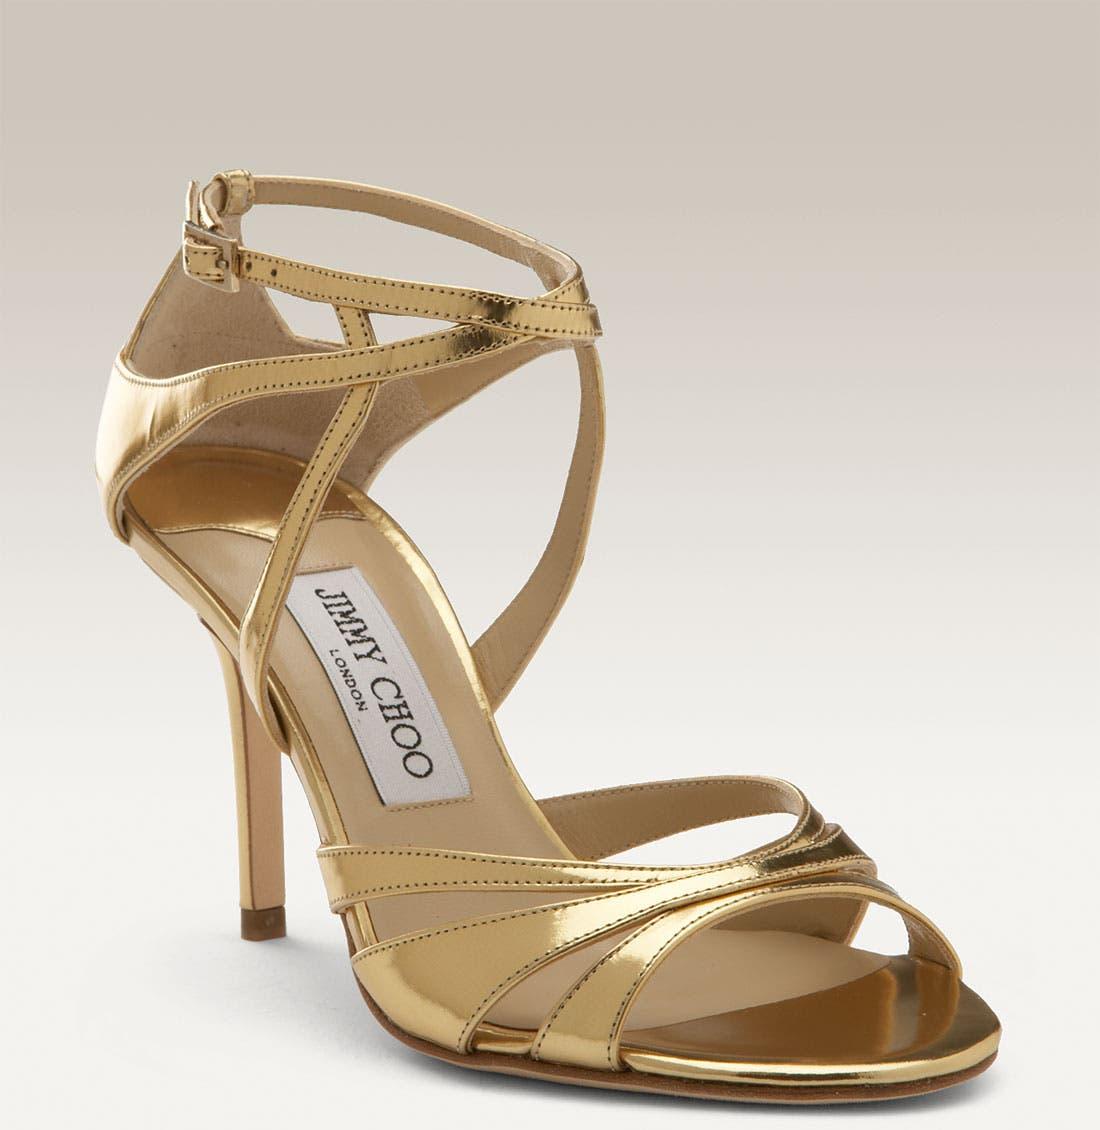 Main Image - Jimmy Choo 'Freya' Metallic Leather Sandal